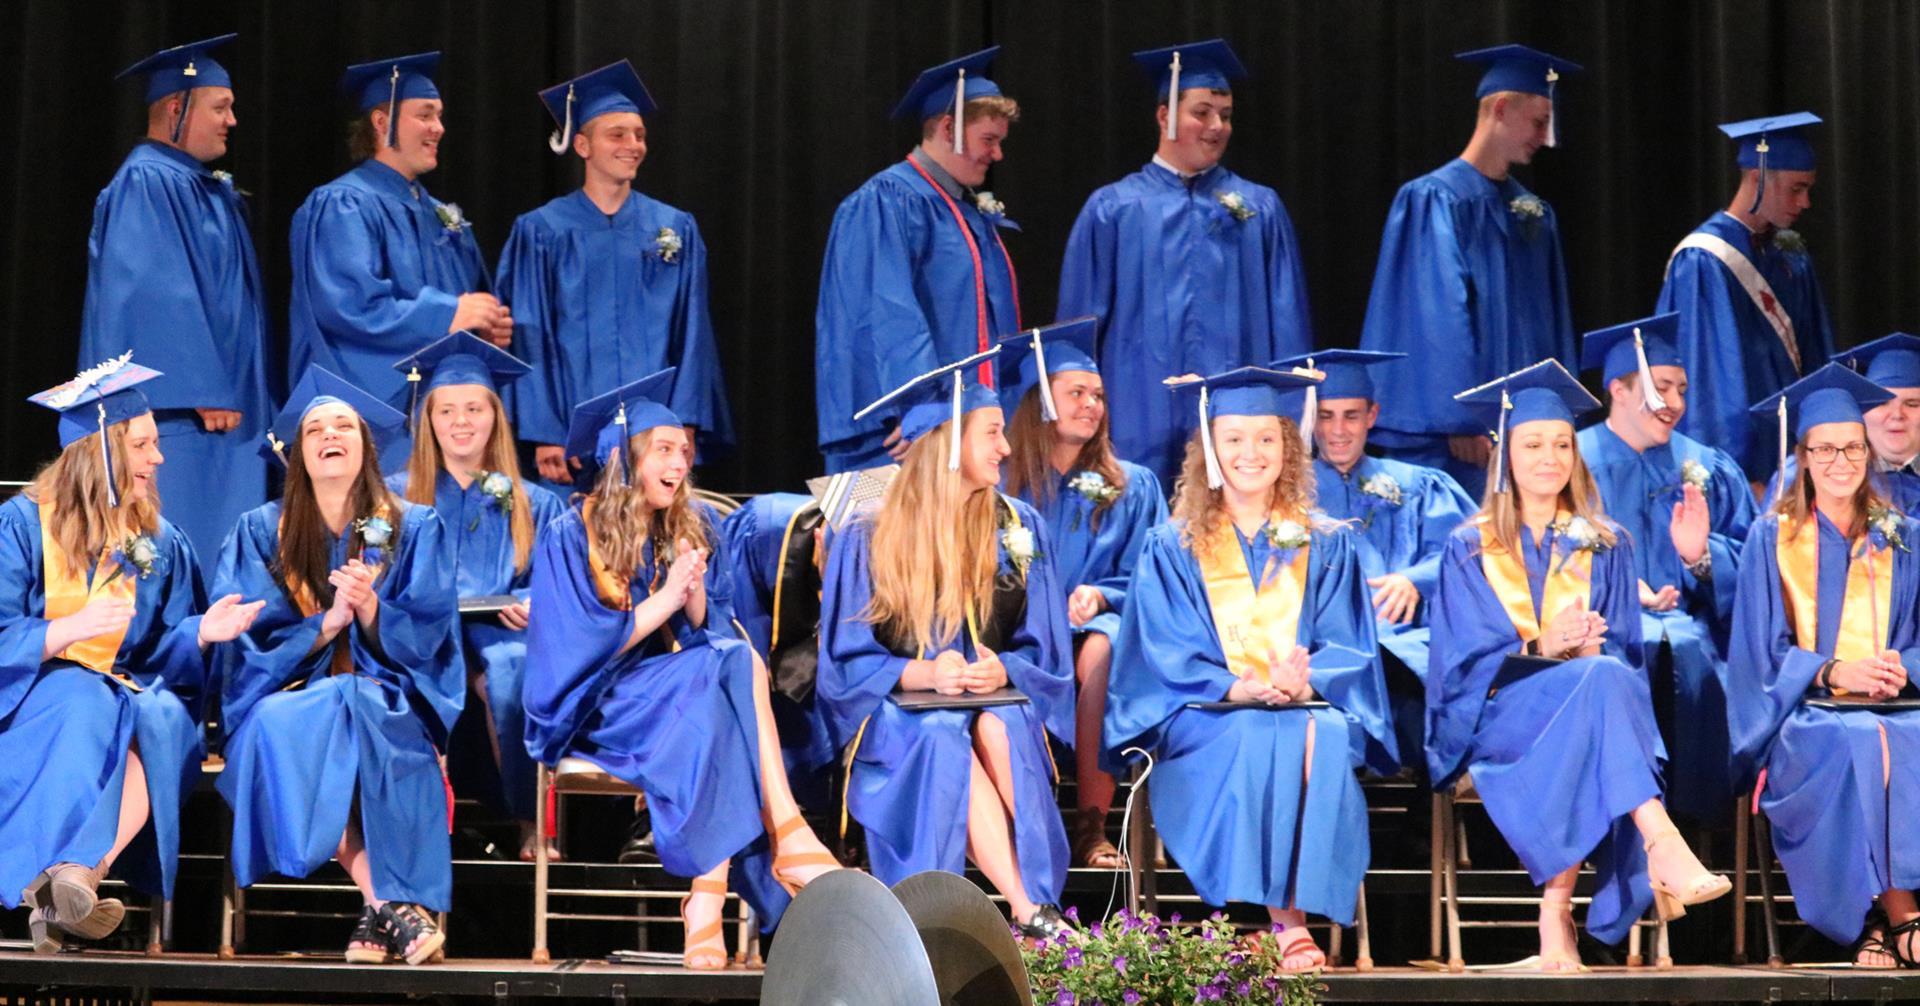 Hancock students at 2019 Graduation Ceremony